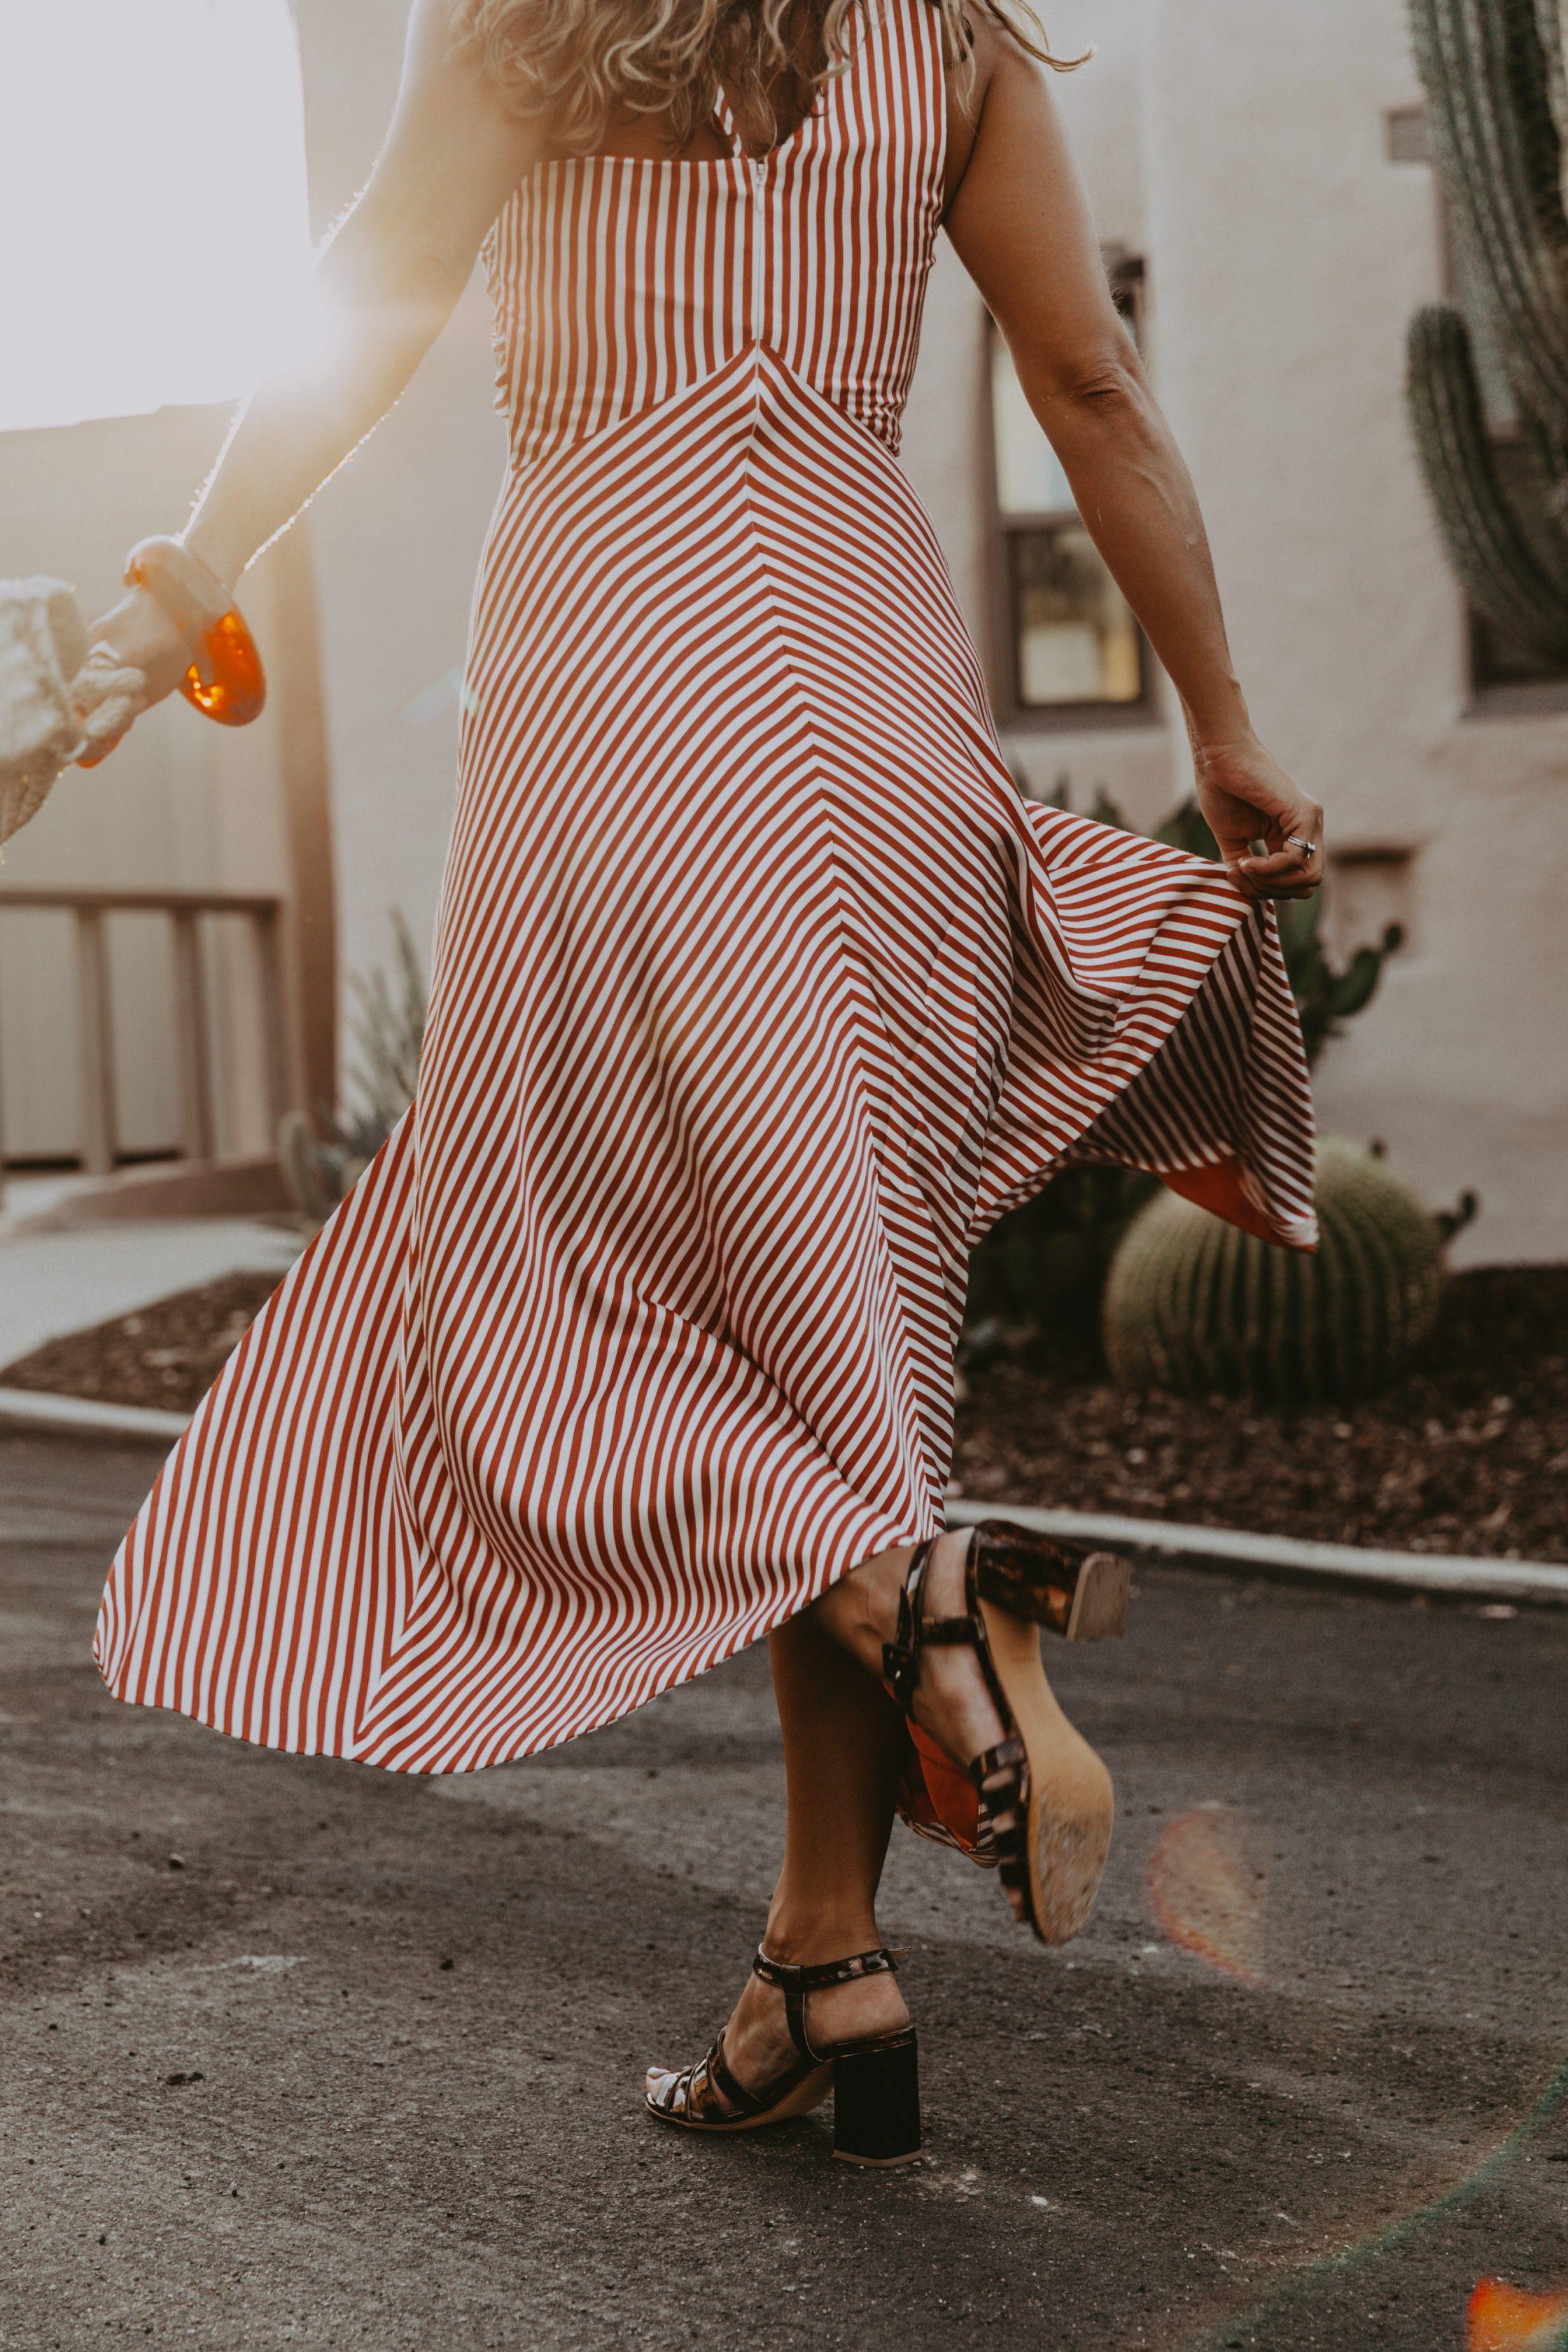 Sara Escudero for Collage Vintage is wearing a Jonathan Simkhai striped dress